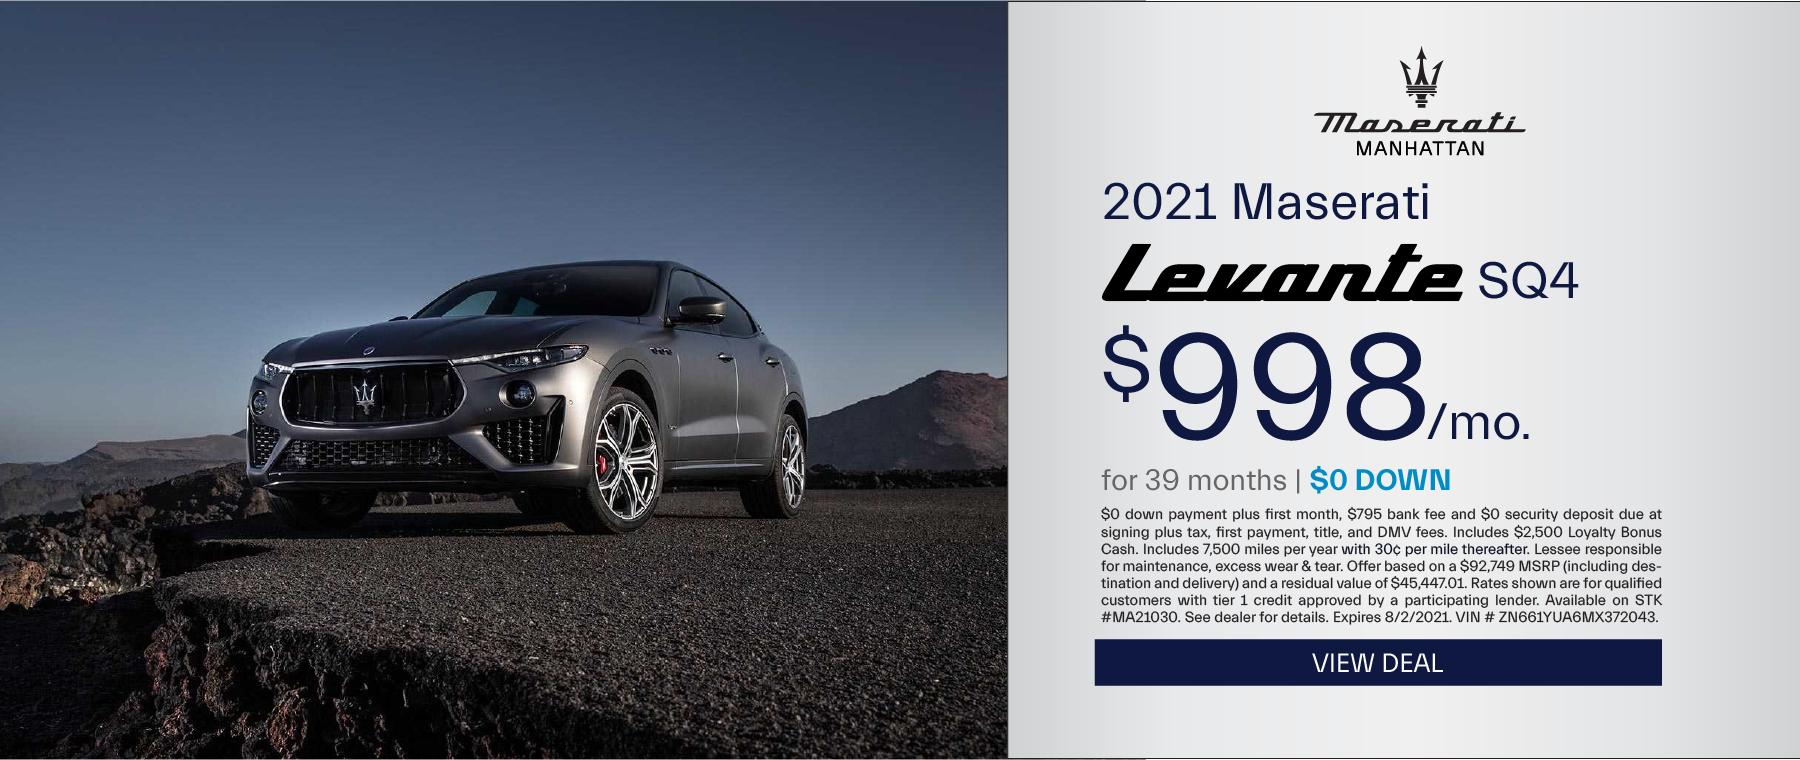 Maserati of Manhattan – 2021 Levante SQ4 – July 2021